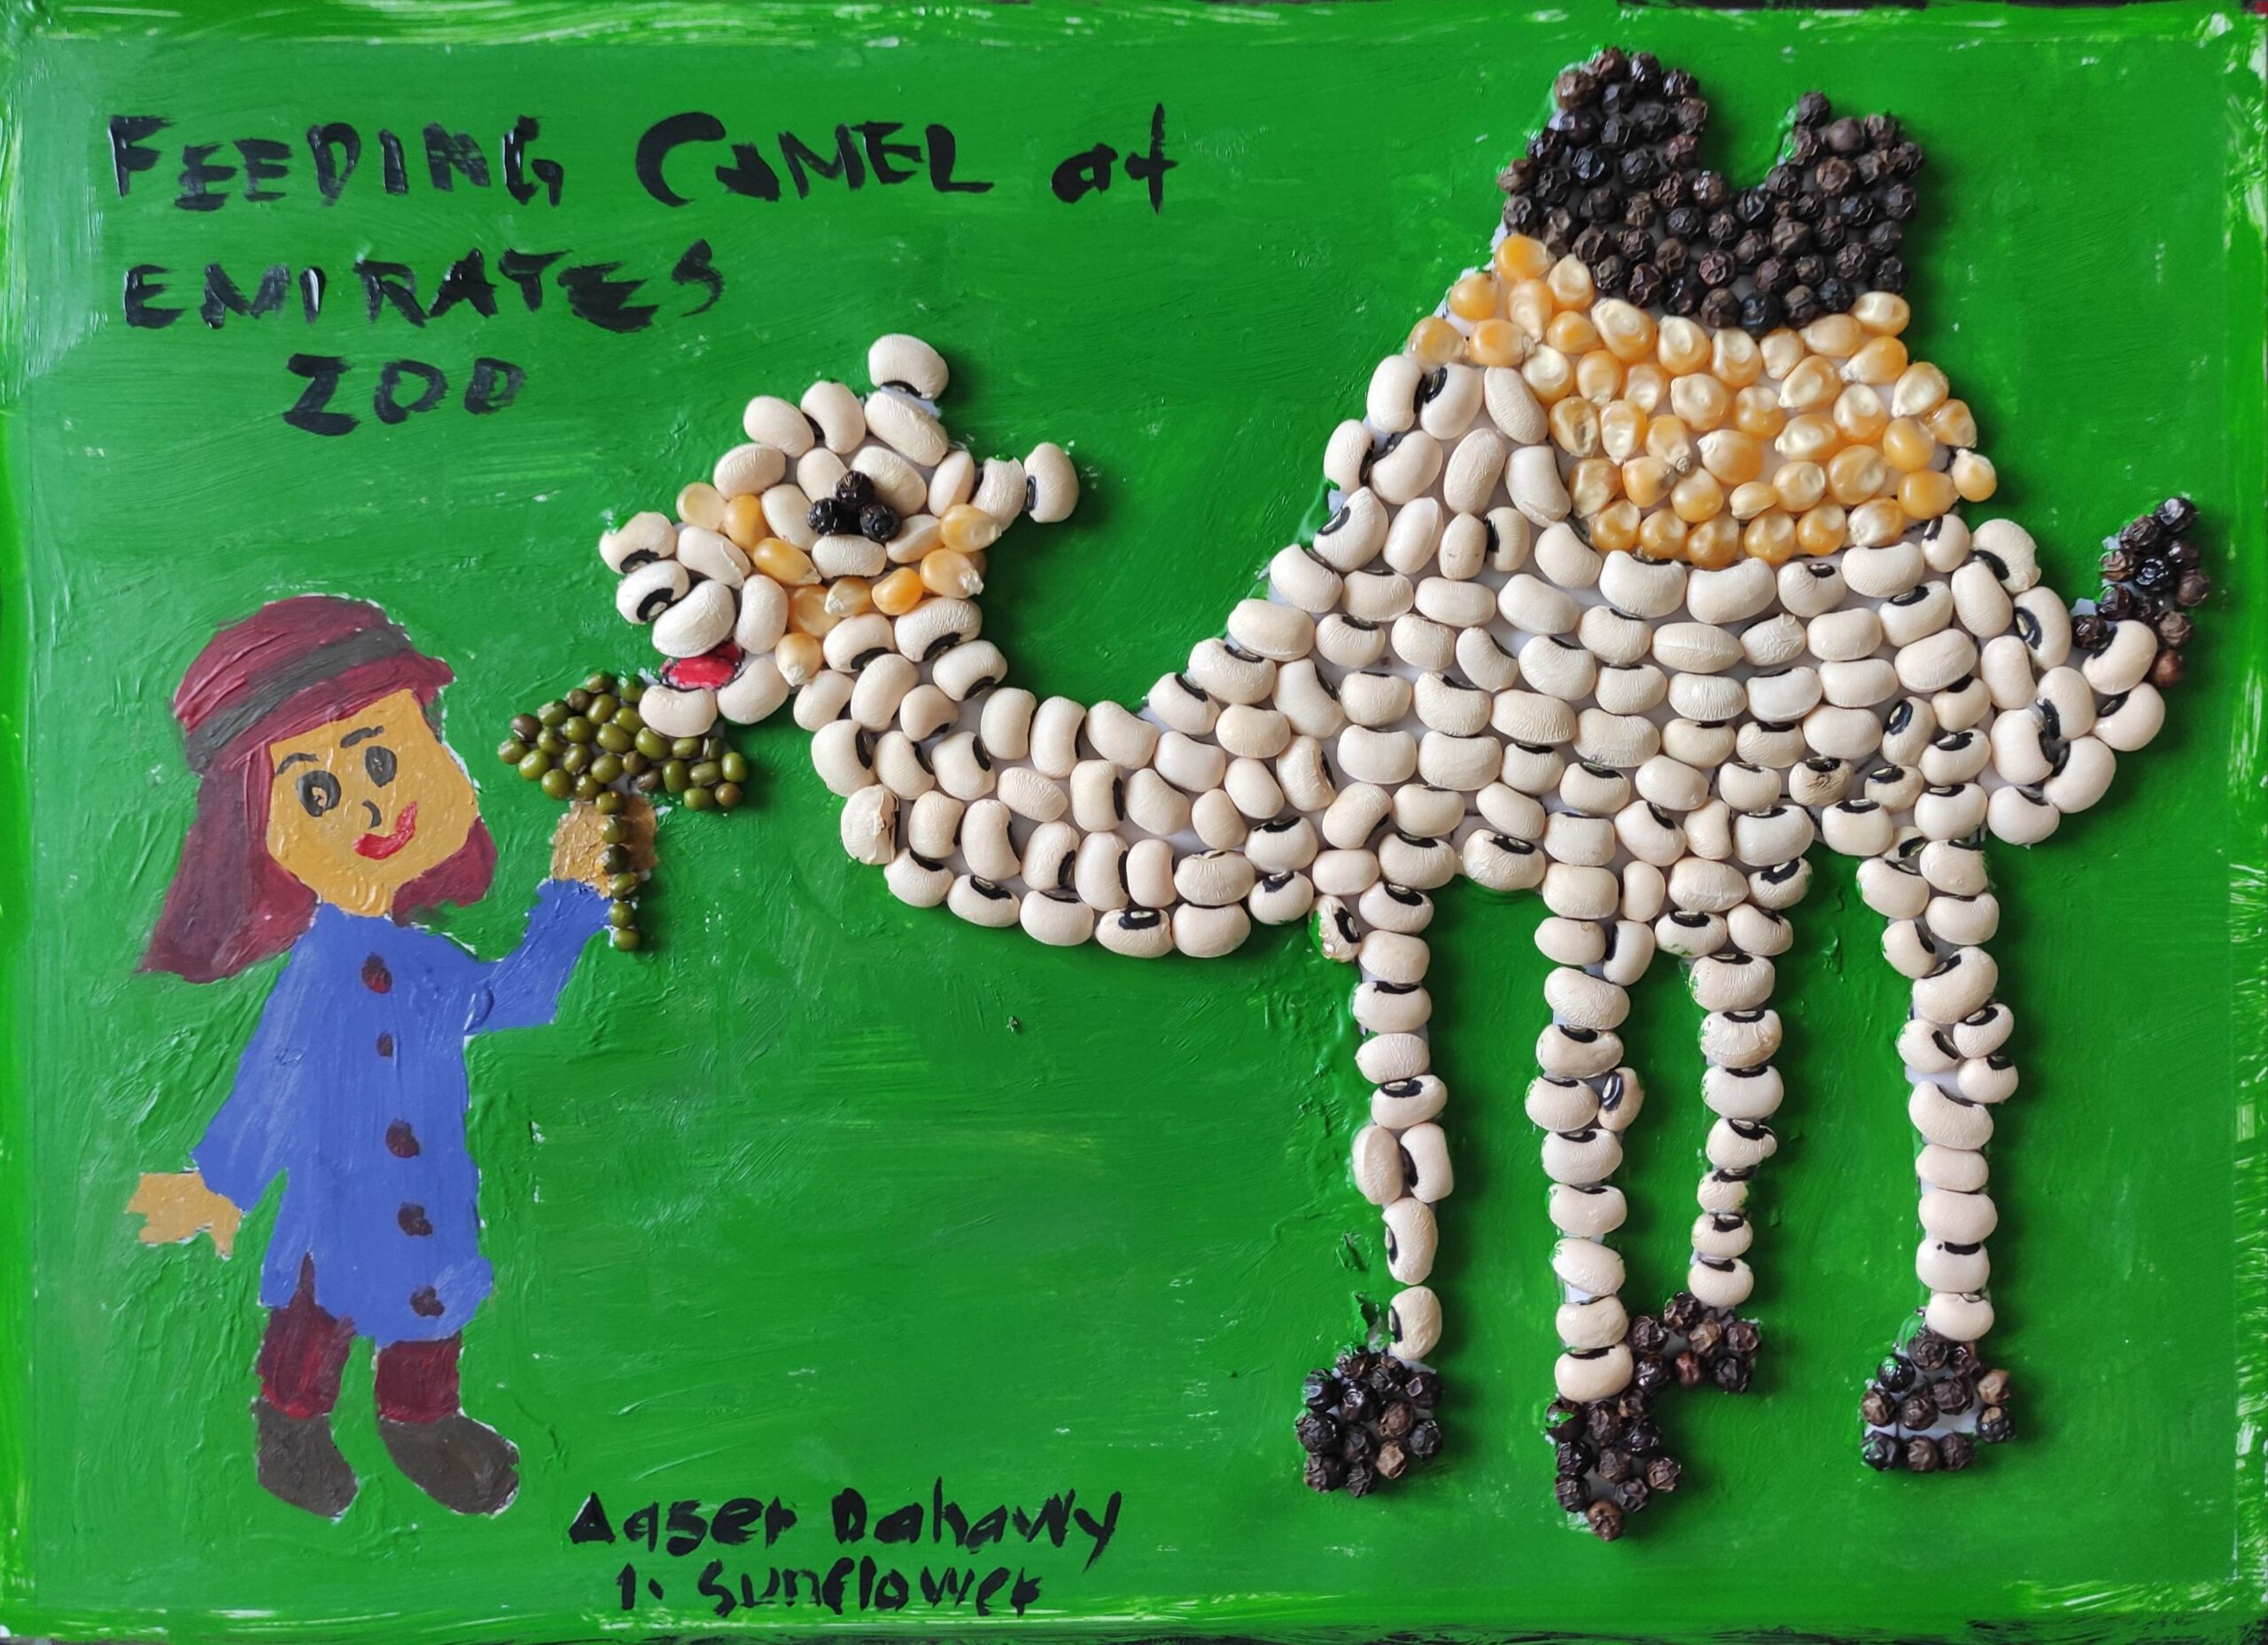 Feeding Camel at Emirates Zoo by Aaser Dahawy